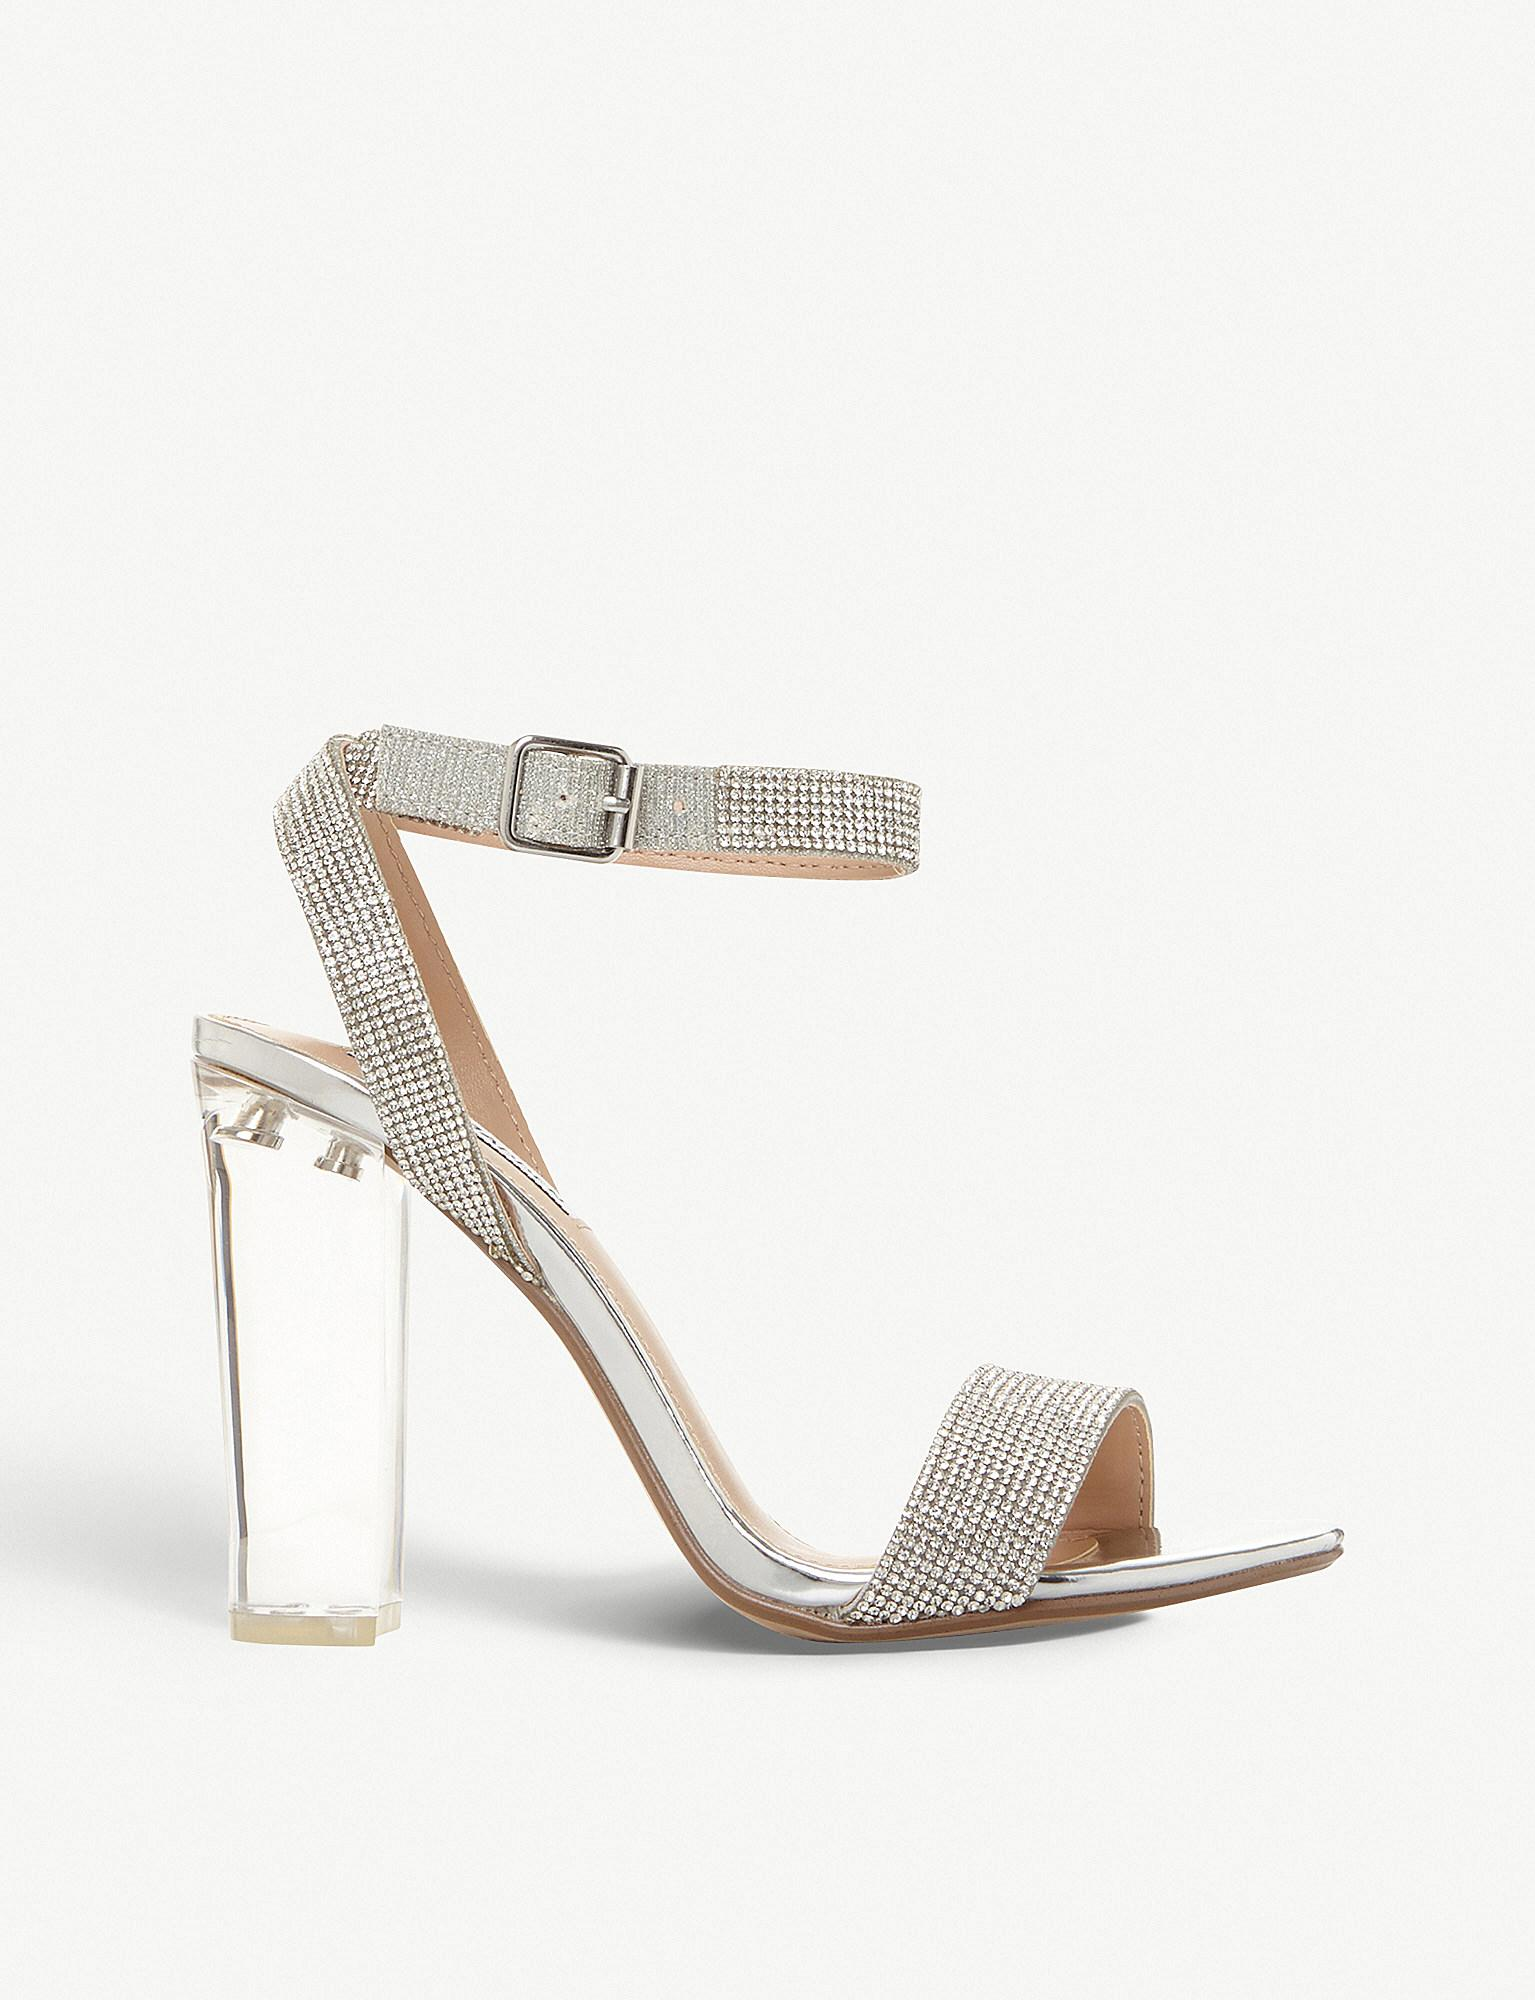 cb255209c32 Steve Madden. Women s Metallic Crysler Crystal-embellished Block Heel  Sandals